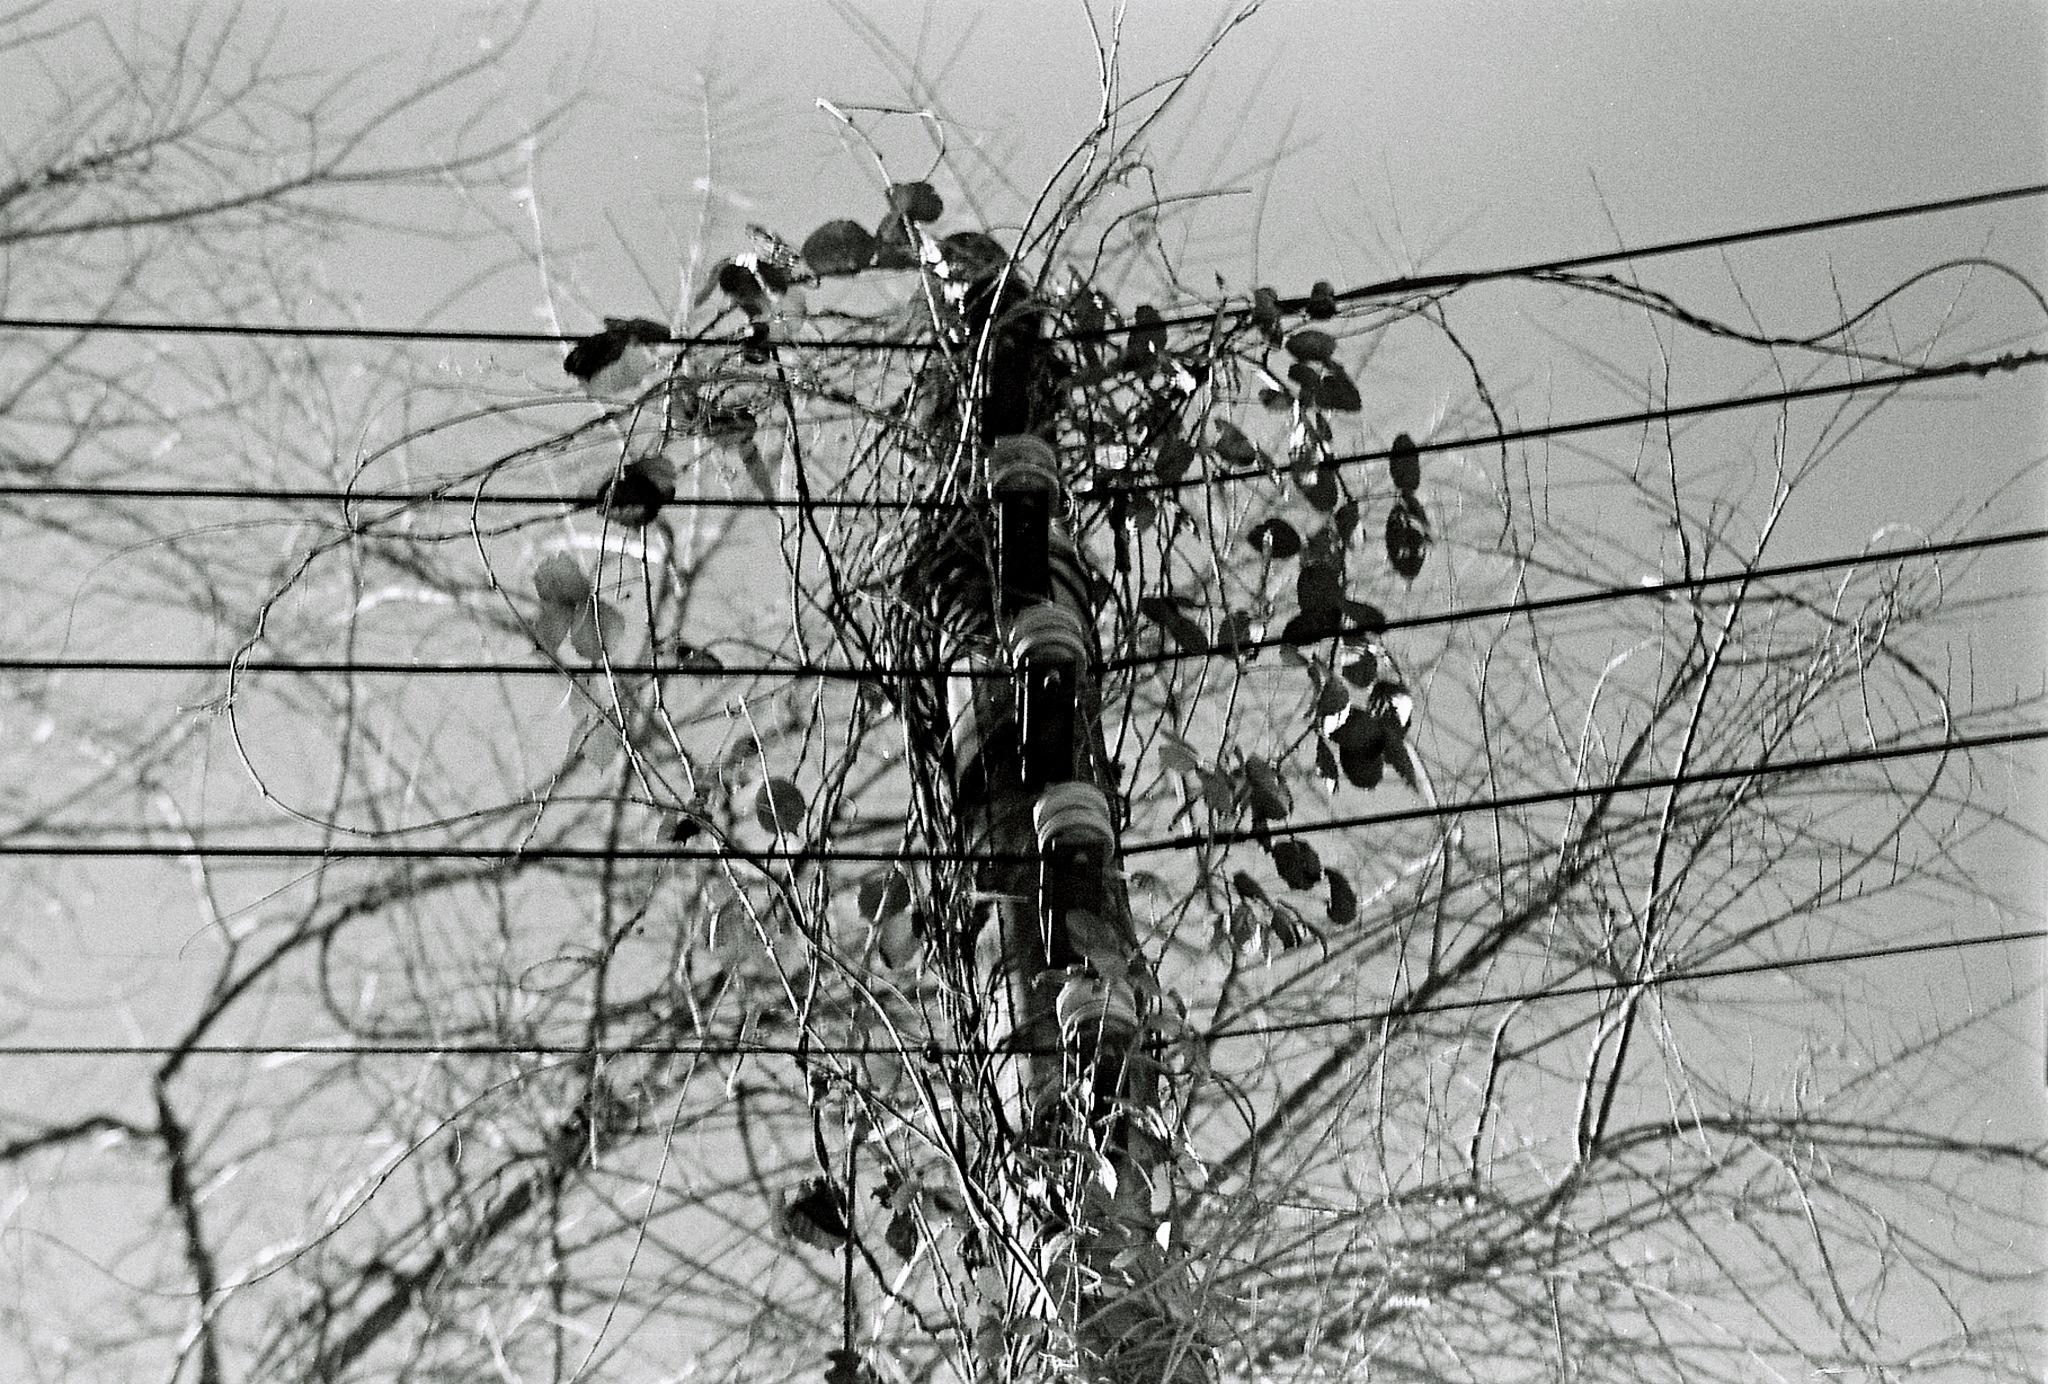 A heart on wires by  Sotiris Hartzavalos